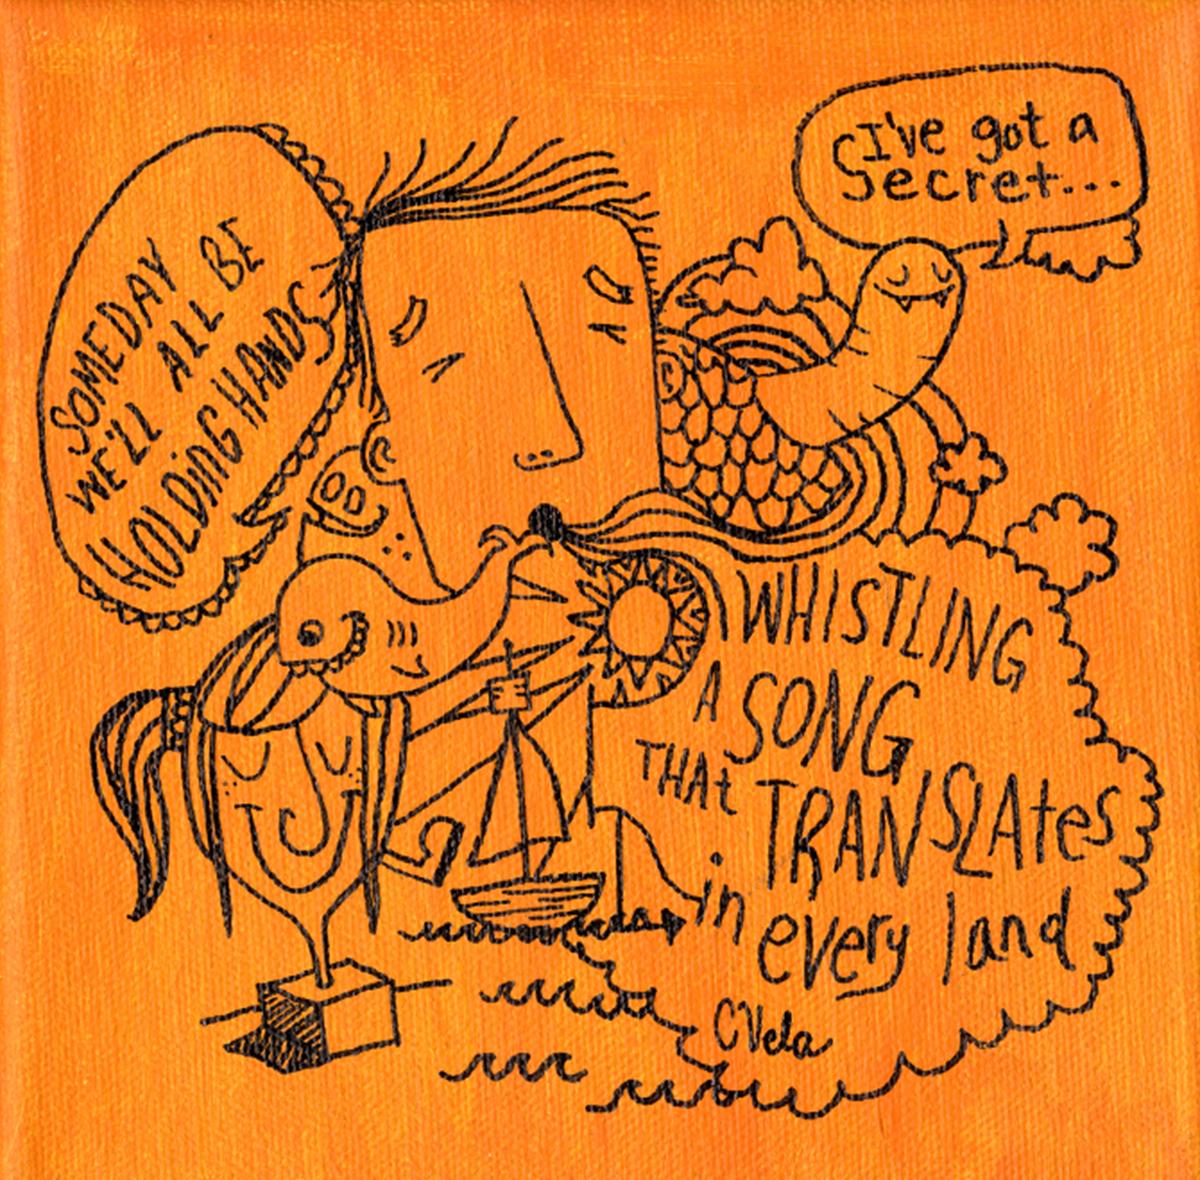 CanvasForACause_cvela_Doodles_Orange.jpg